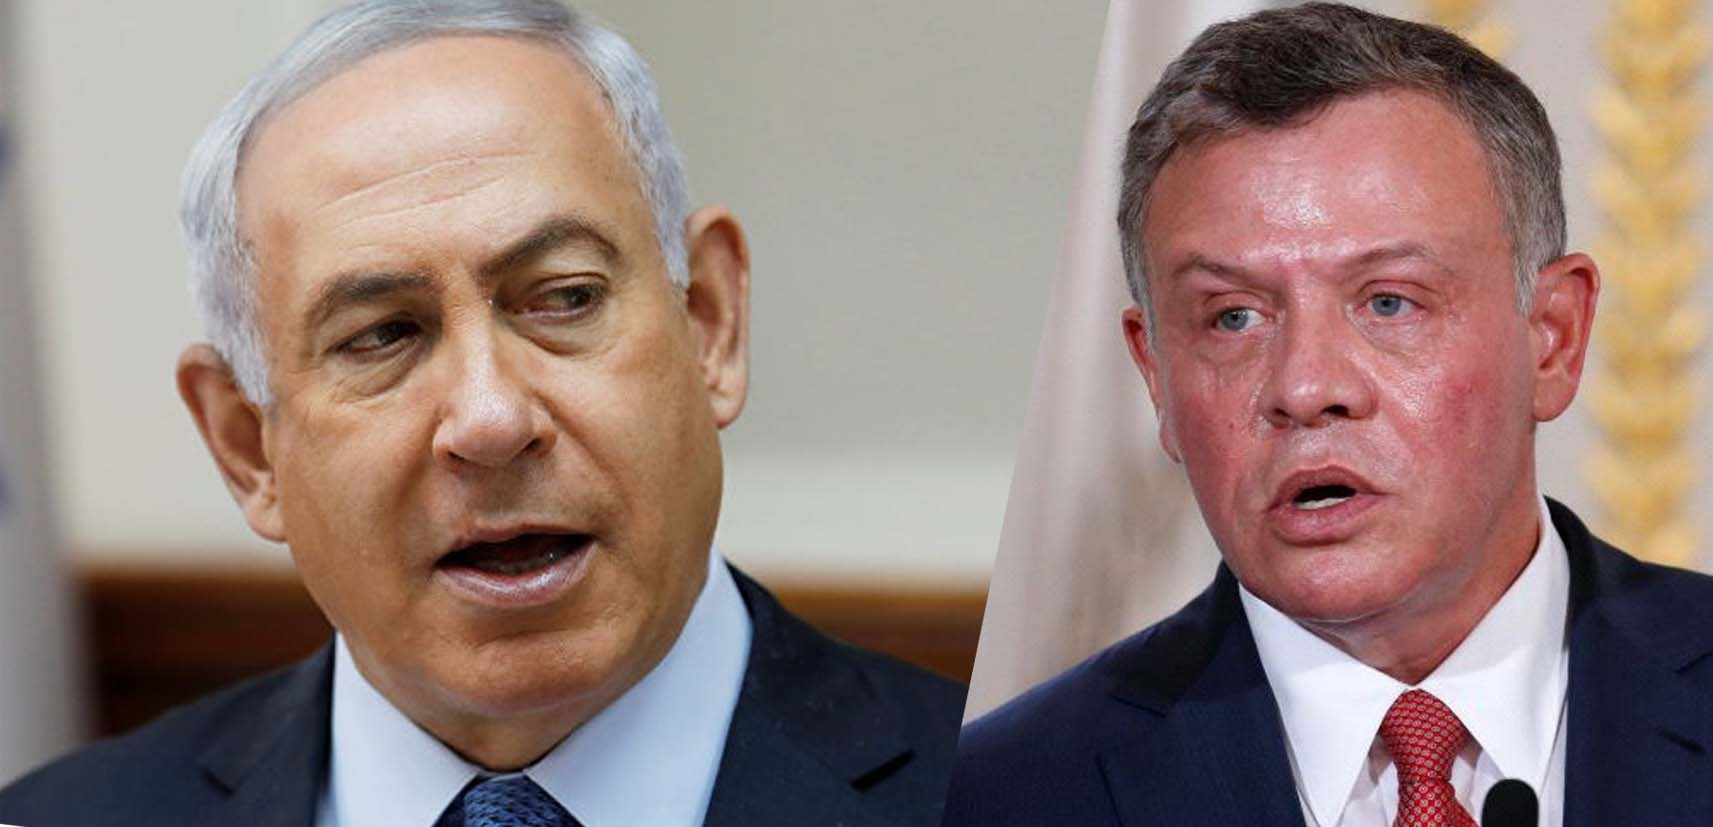 इस्रायली प्रधानमंत्री नेत्यान्याहू और जॉर्डन के राजा अब्दुल्ला में चर्चा